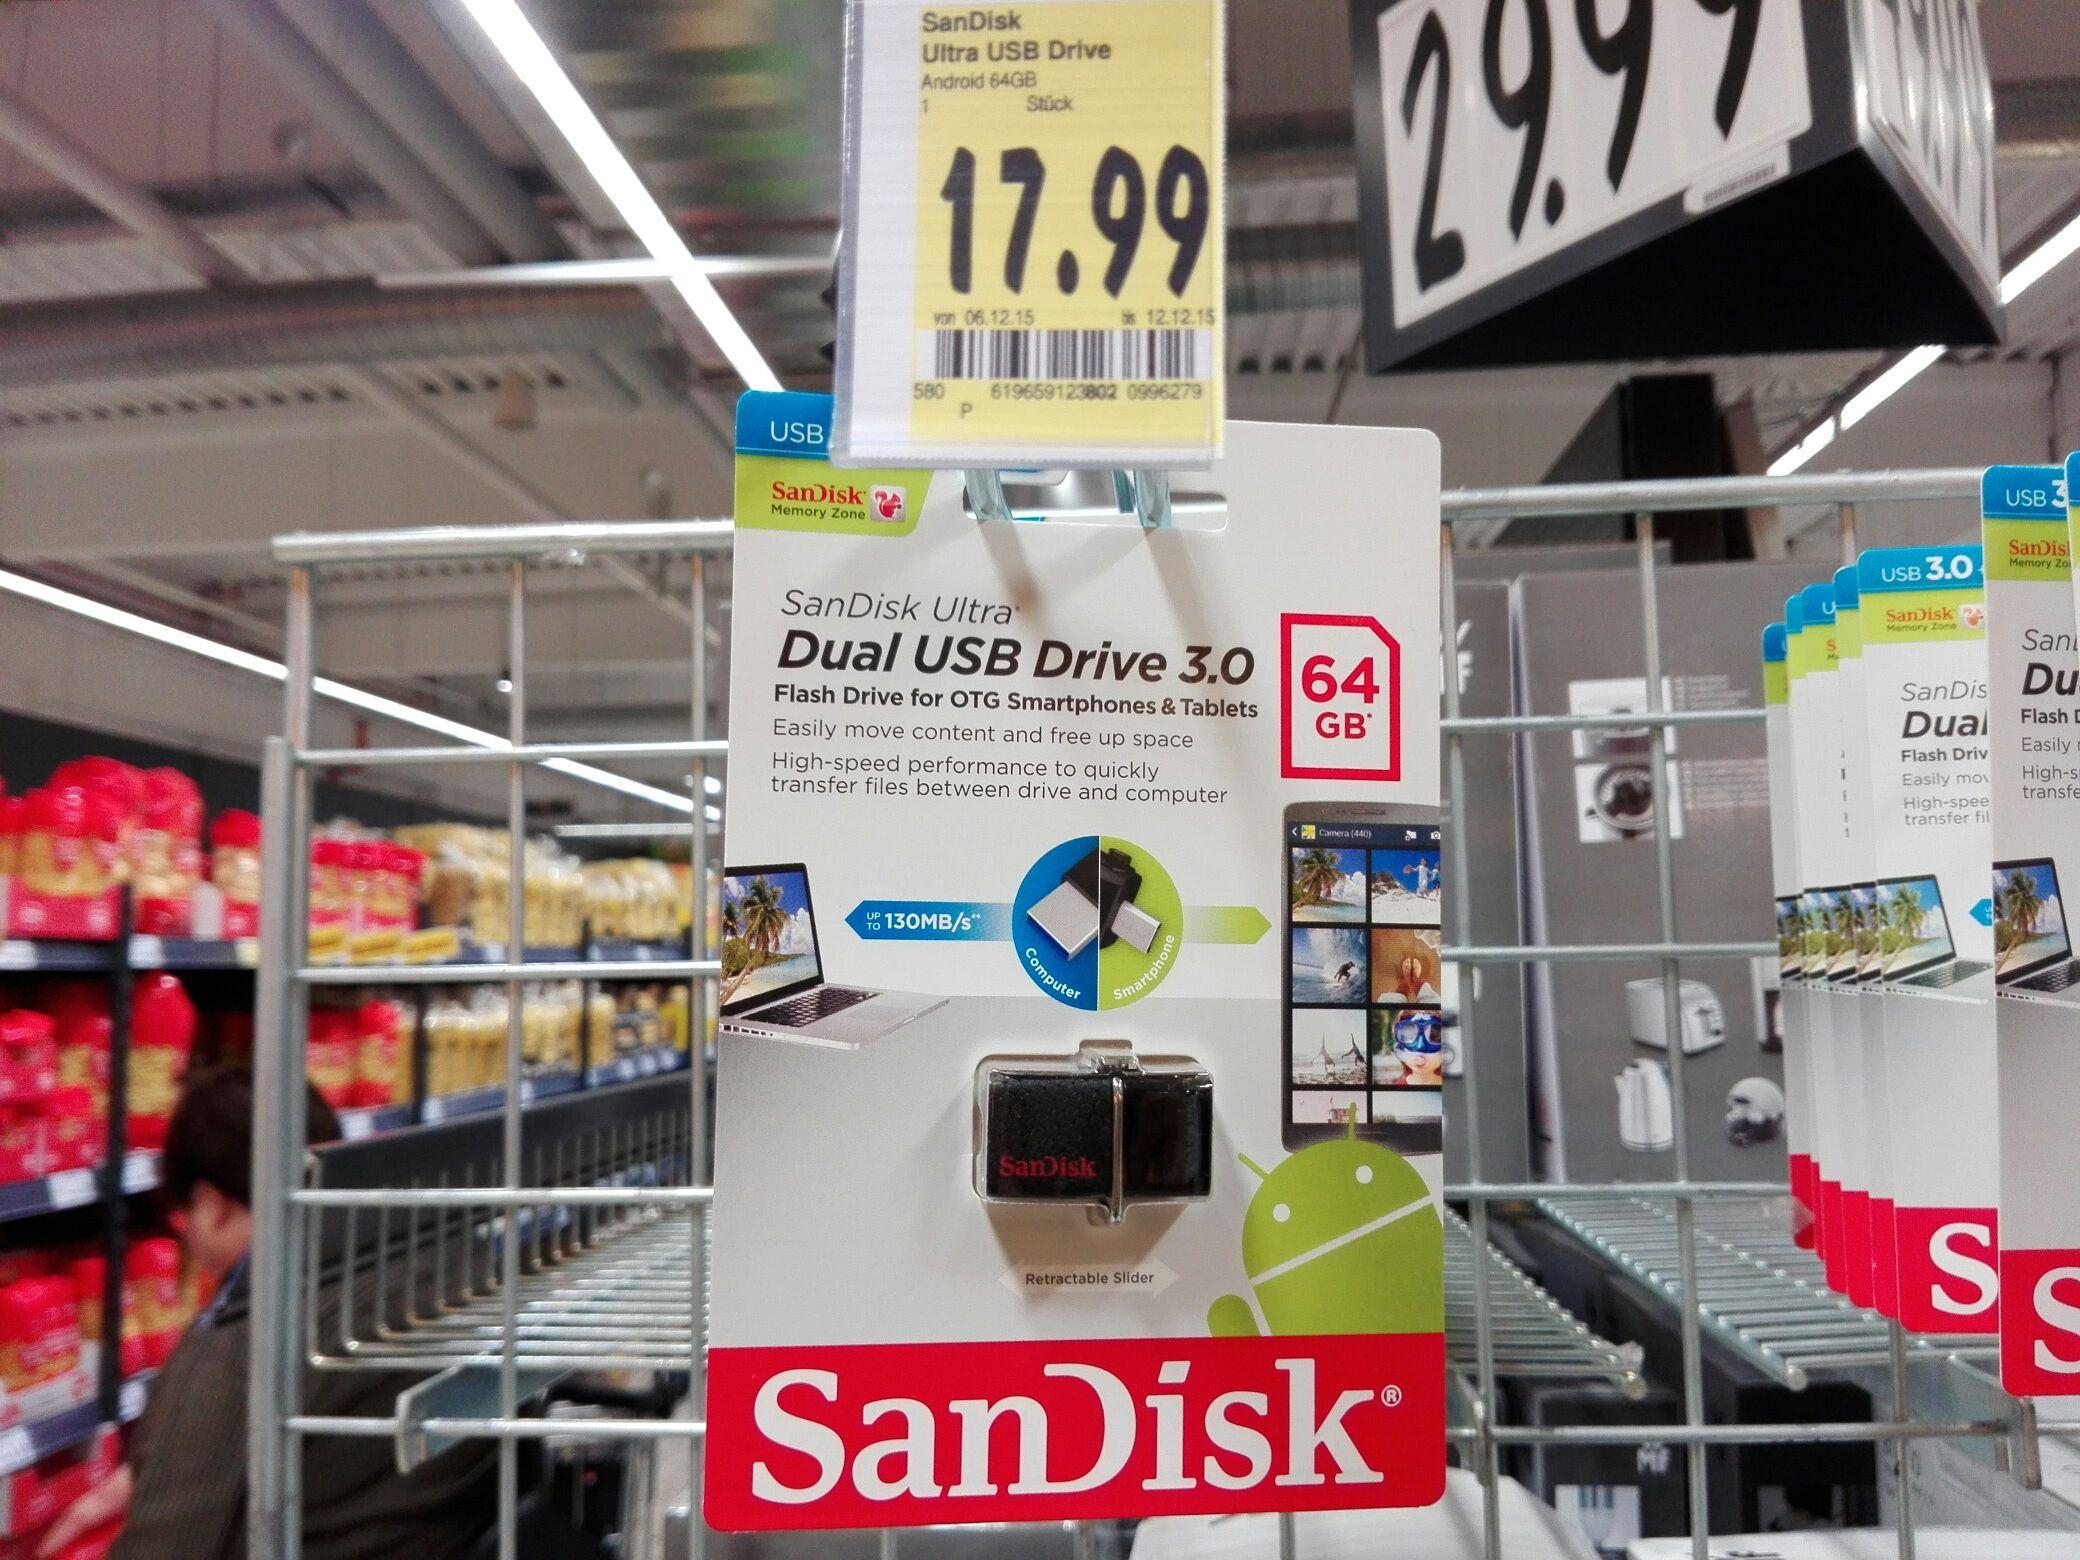 Clé USB 3.0 SanDisk OTG 64Go